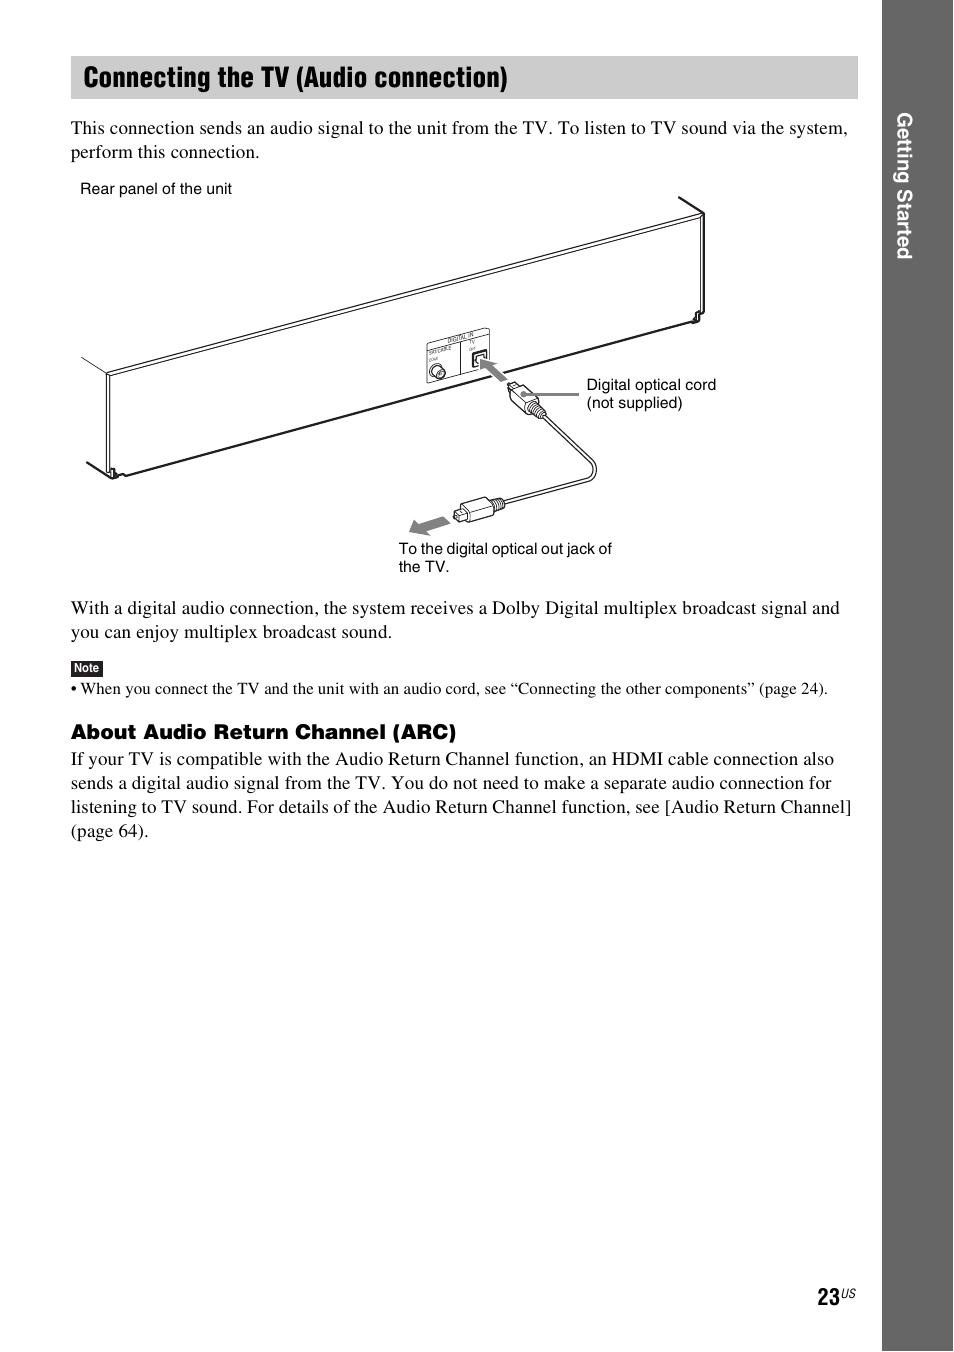 connecting the tv audio connection e 23 ge tting star te d rh manualsdir com Samsung Plasma TV Manual Samsung Smart TV Owners Manual